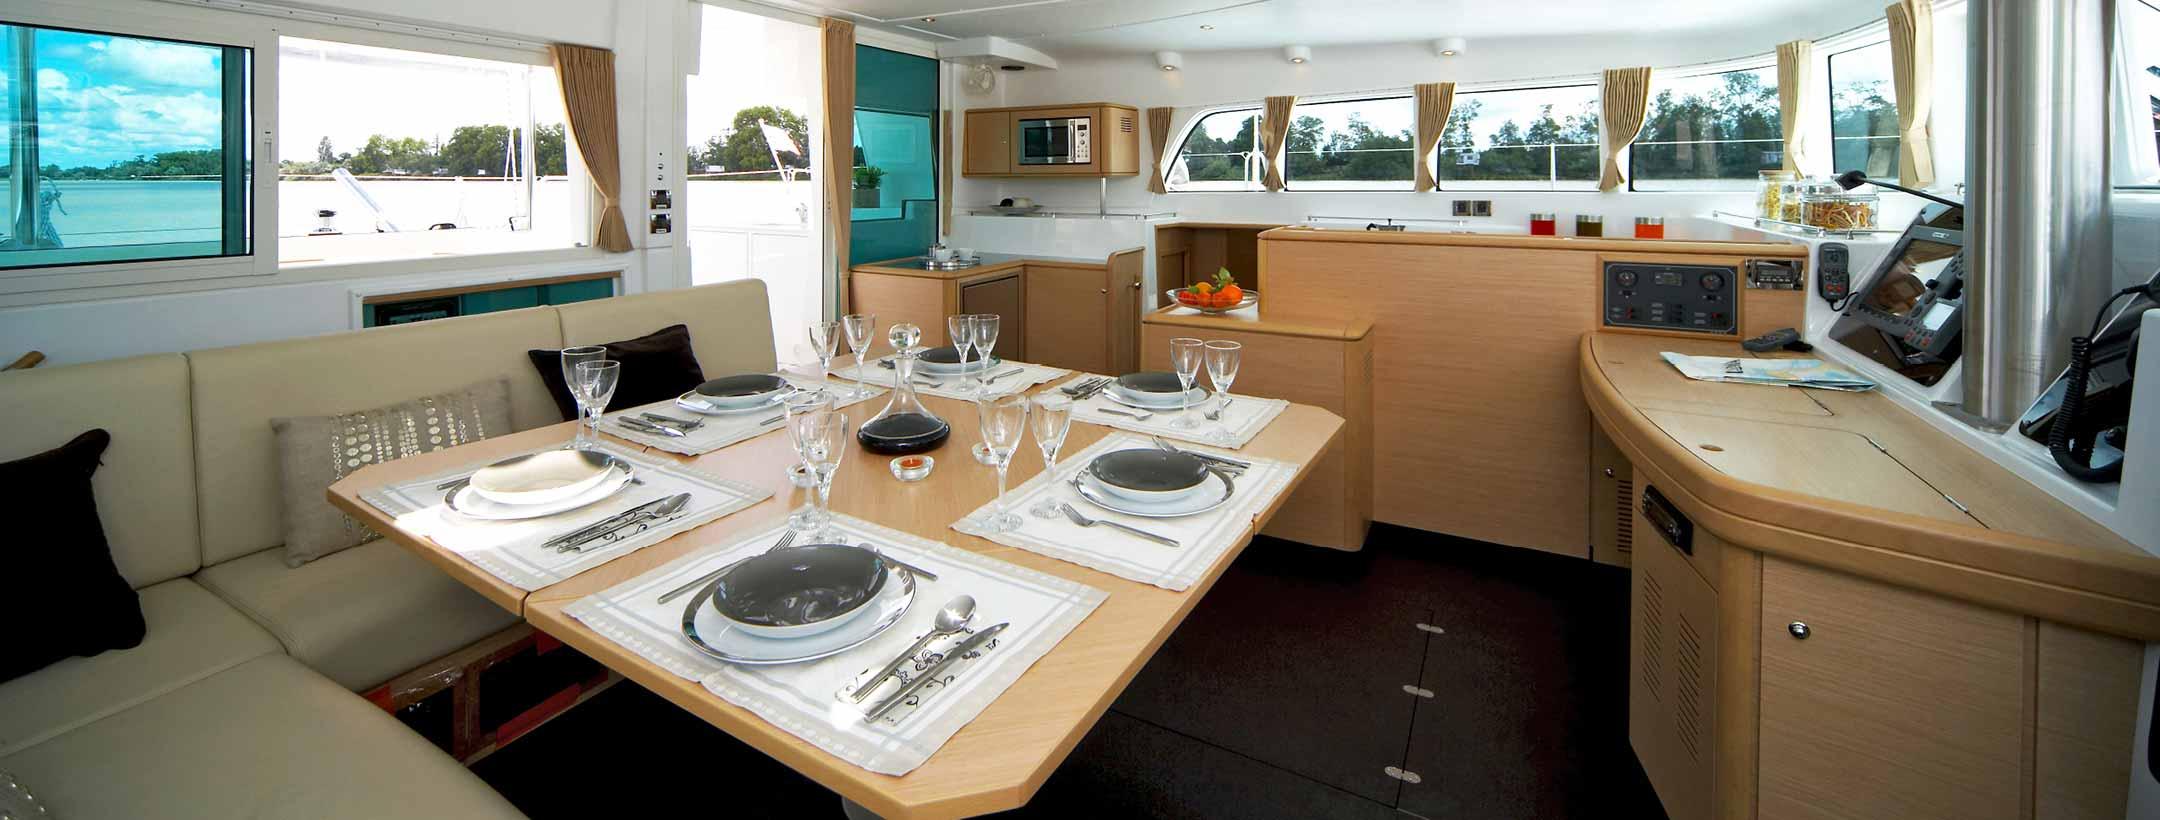 TradeWinds Lagoon 500 Cruising Class Yacht dining area